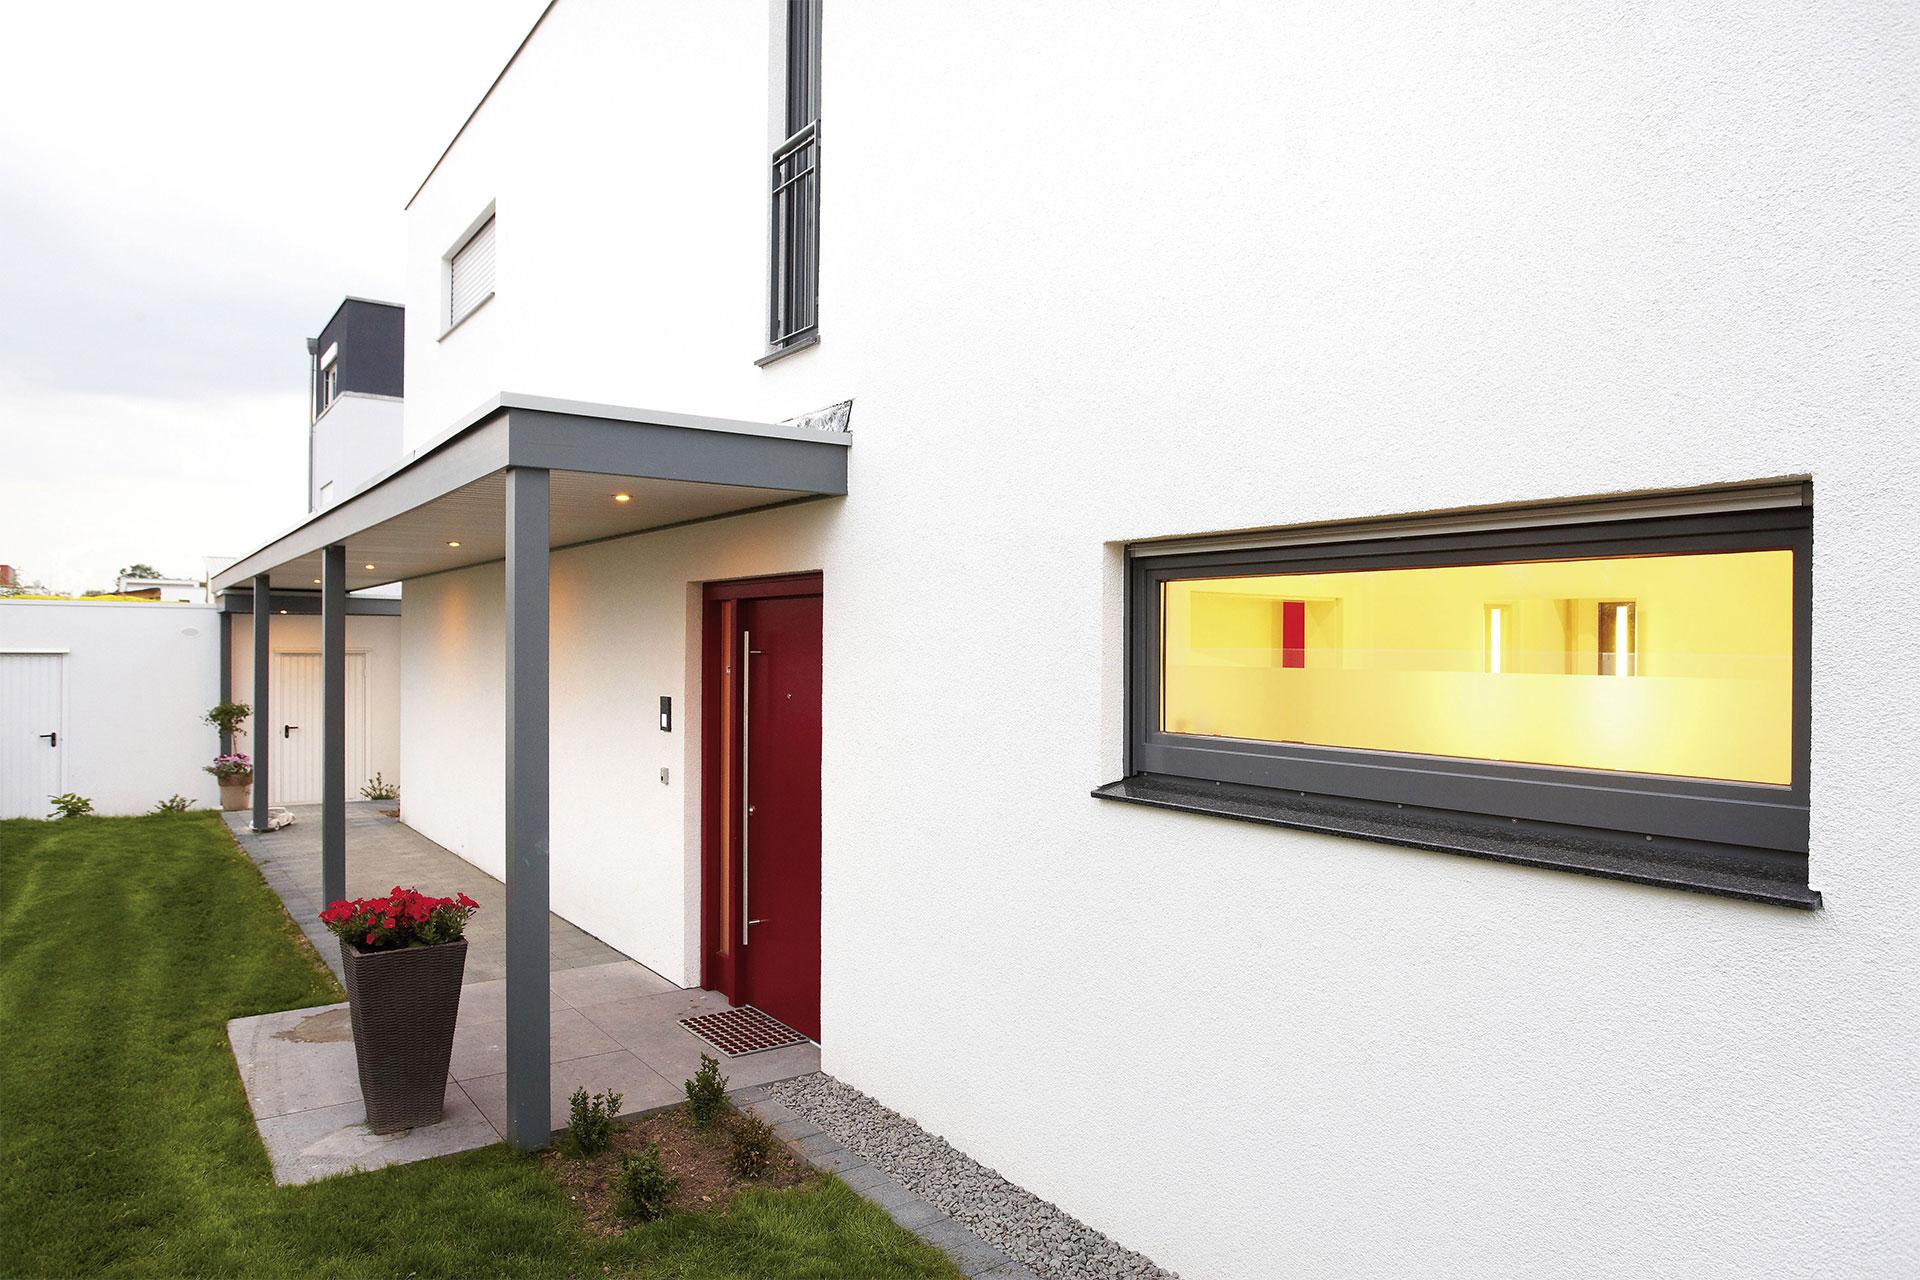 fertighaus flachdach modell trevi ein fertighaus von. Black Bedroom Furniture Sets. Home Design Ideas